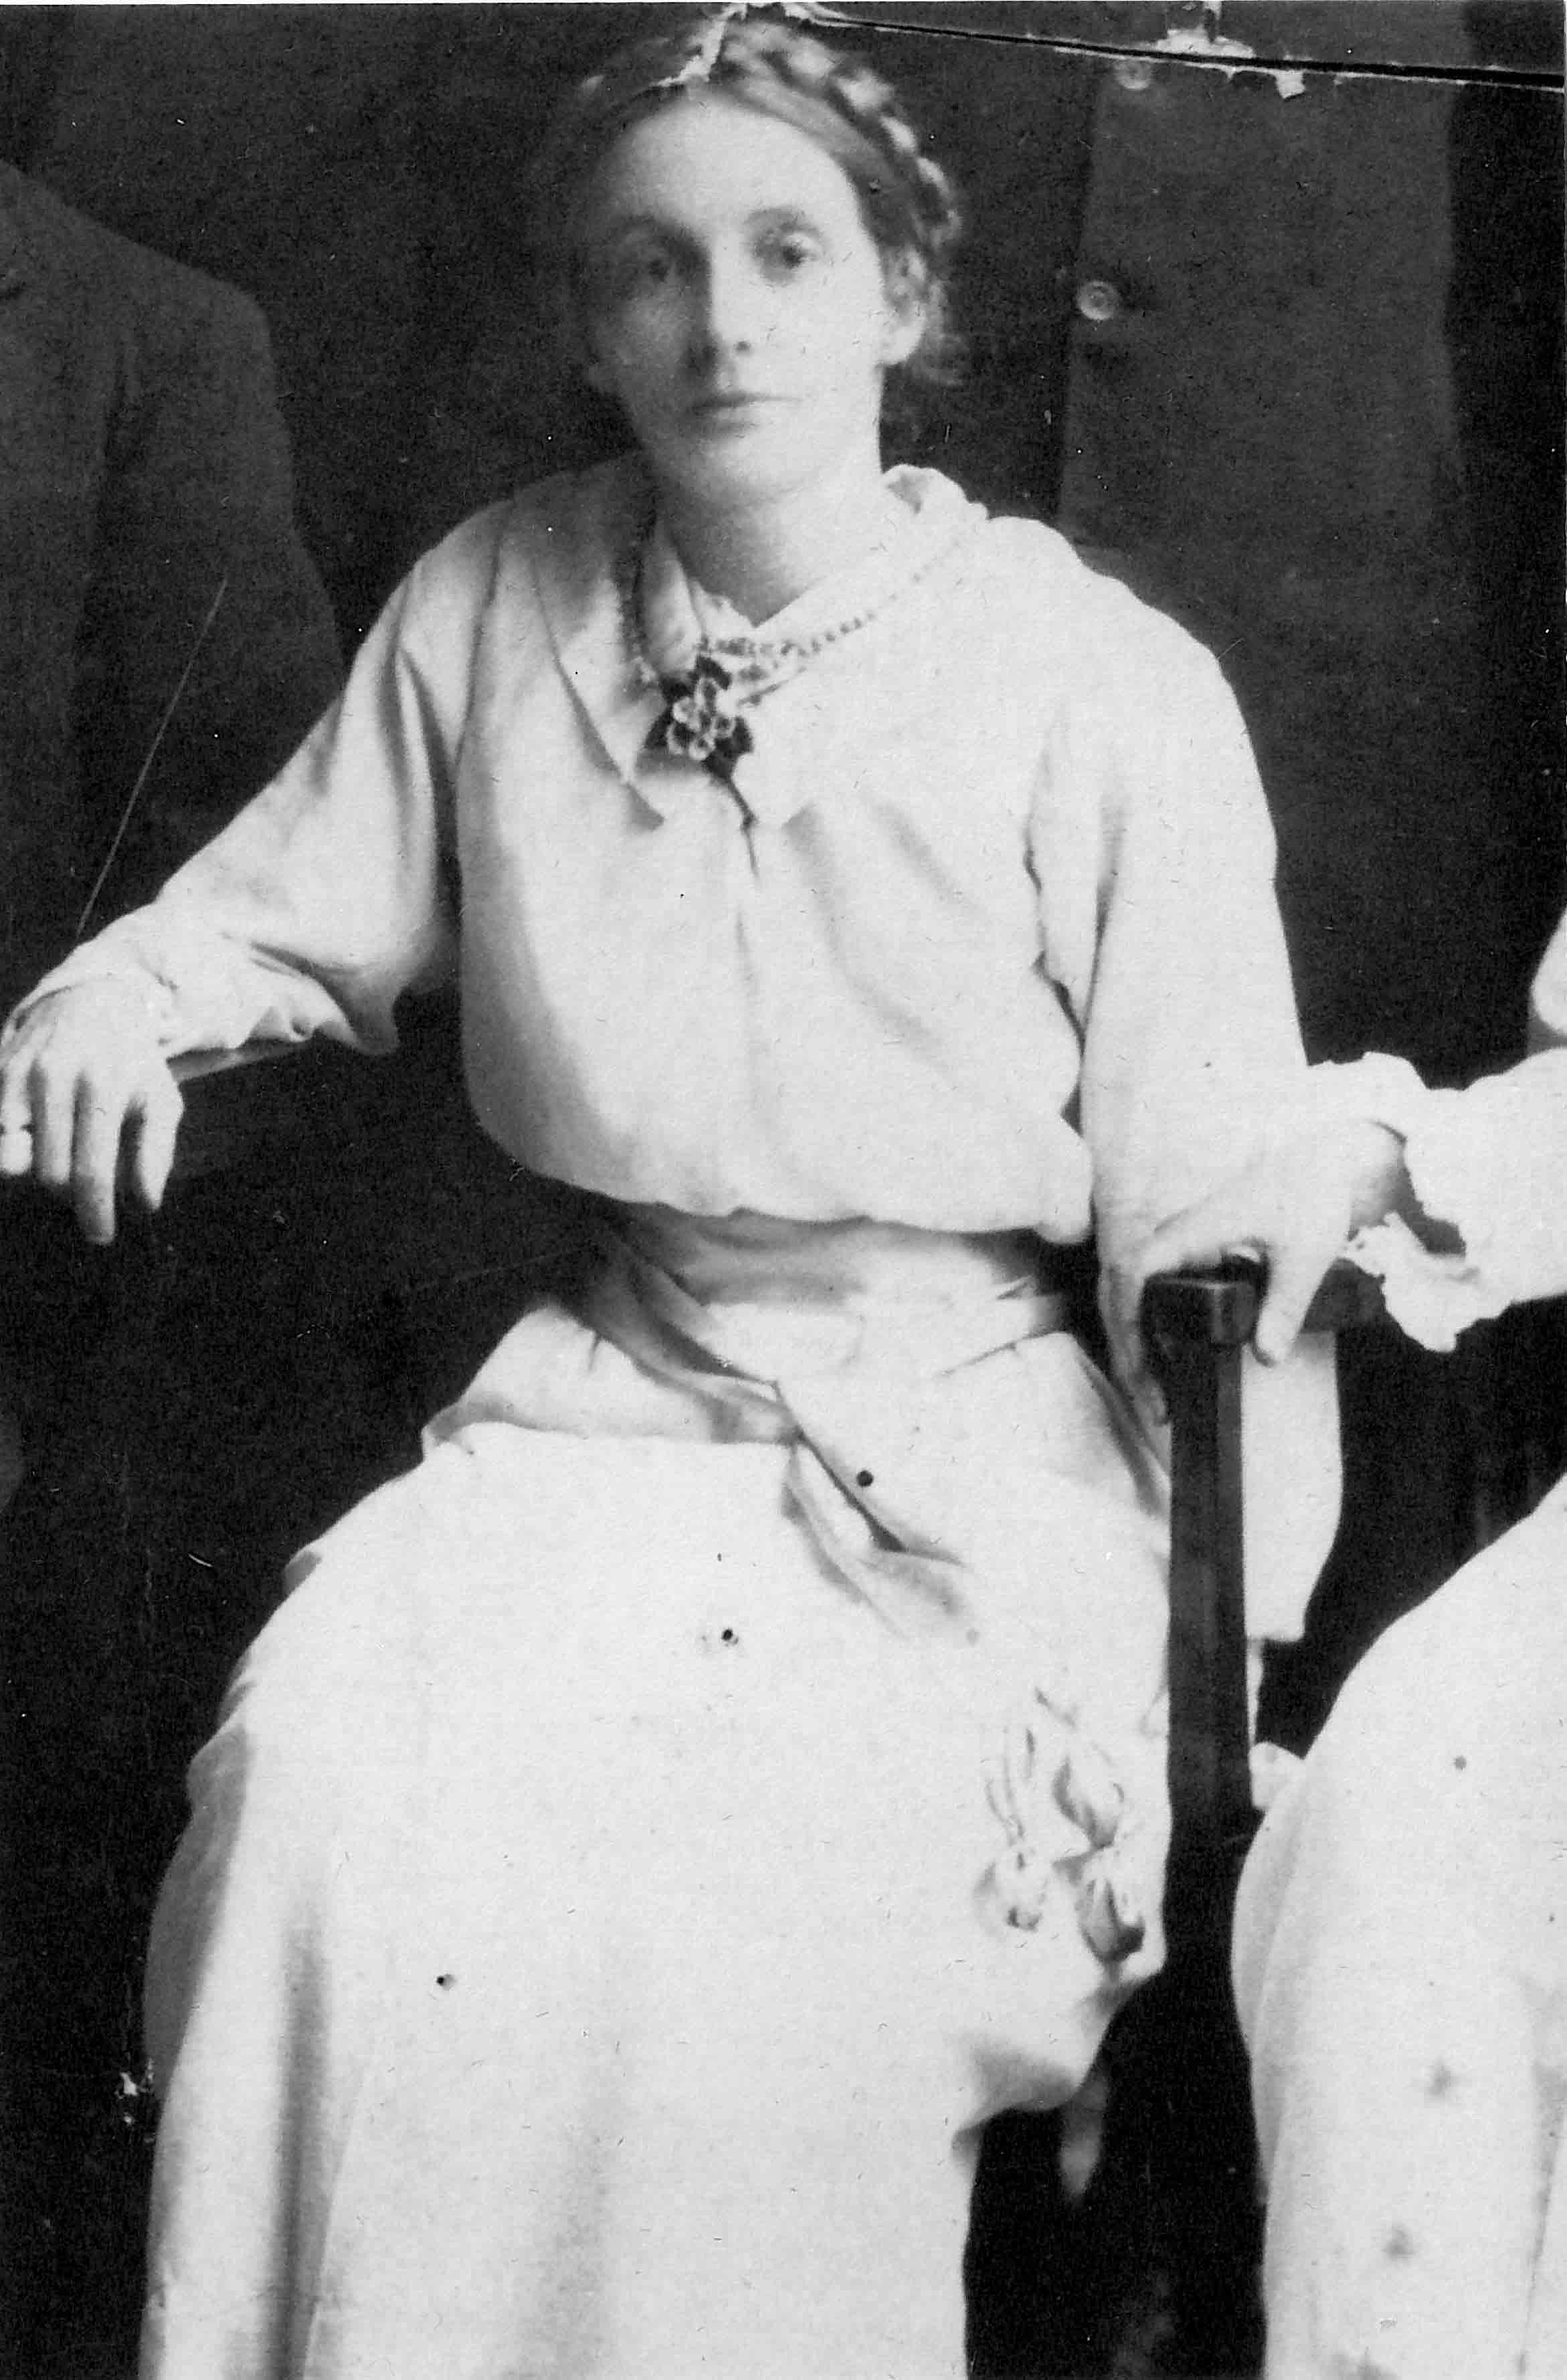 Conrad's maternal grandmother, Lily Beer